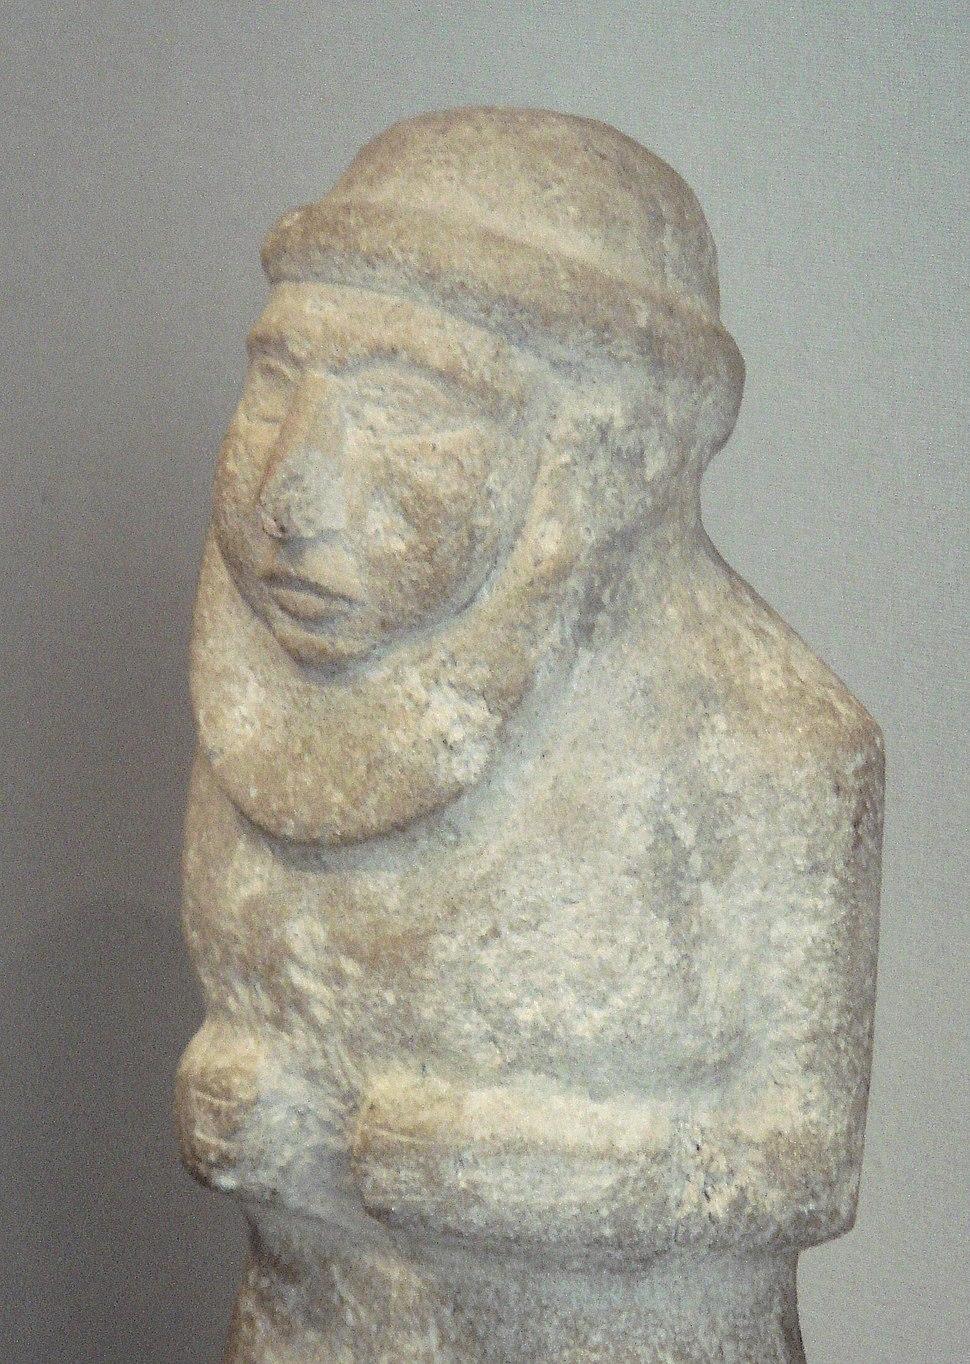 Uruk King-Priest 3300 BCE portrait detail